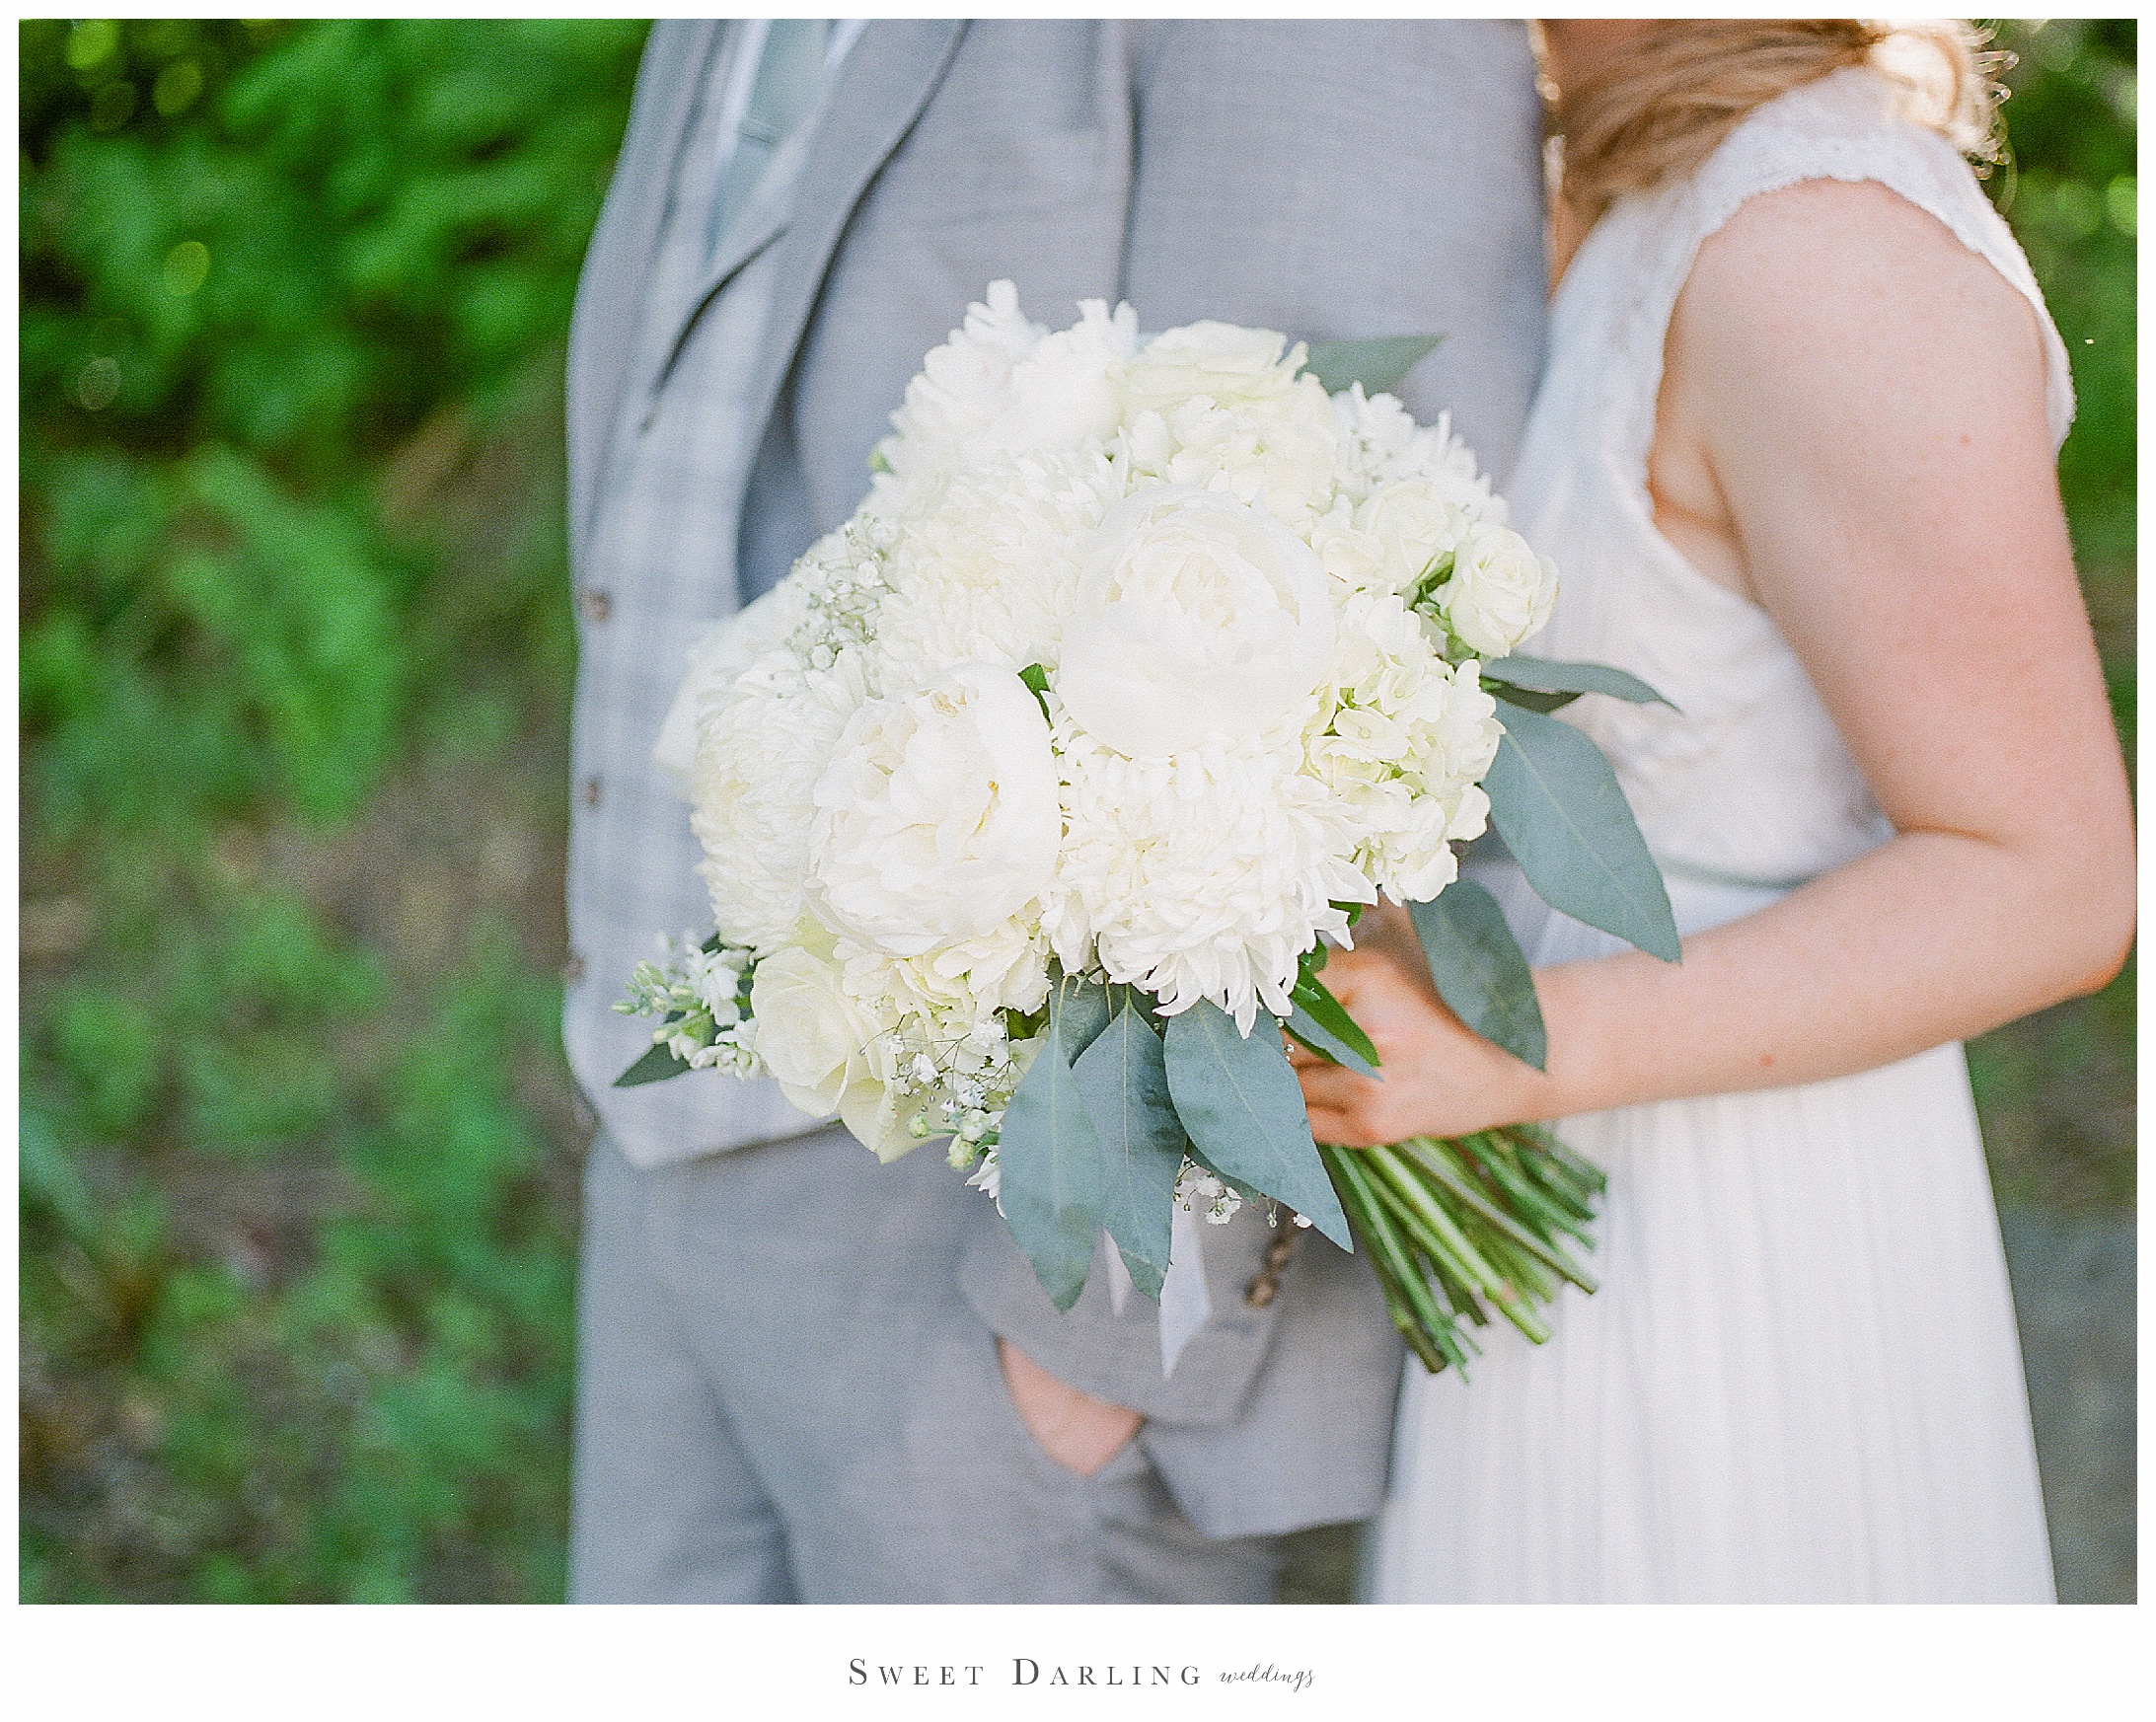 champaign-illinois-boho-summer-wedding-photographer-city-center-sweet-darling-weddings_2335.jpg